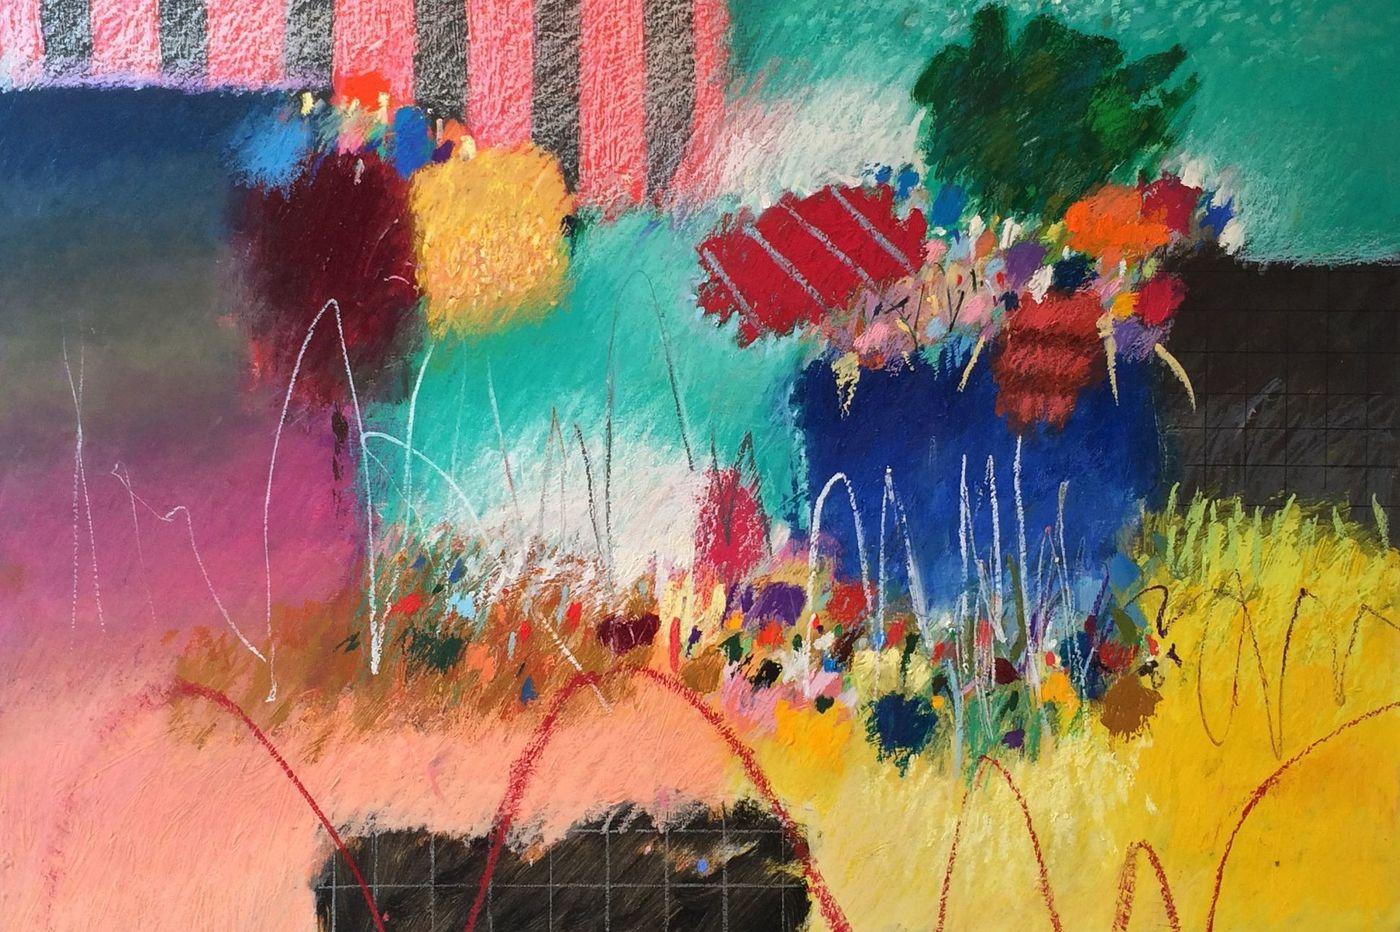 Hamptons-style art fair comes to Philadelphia